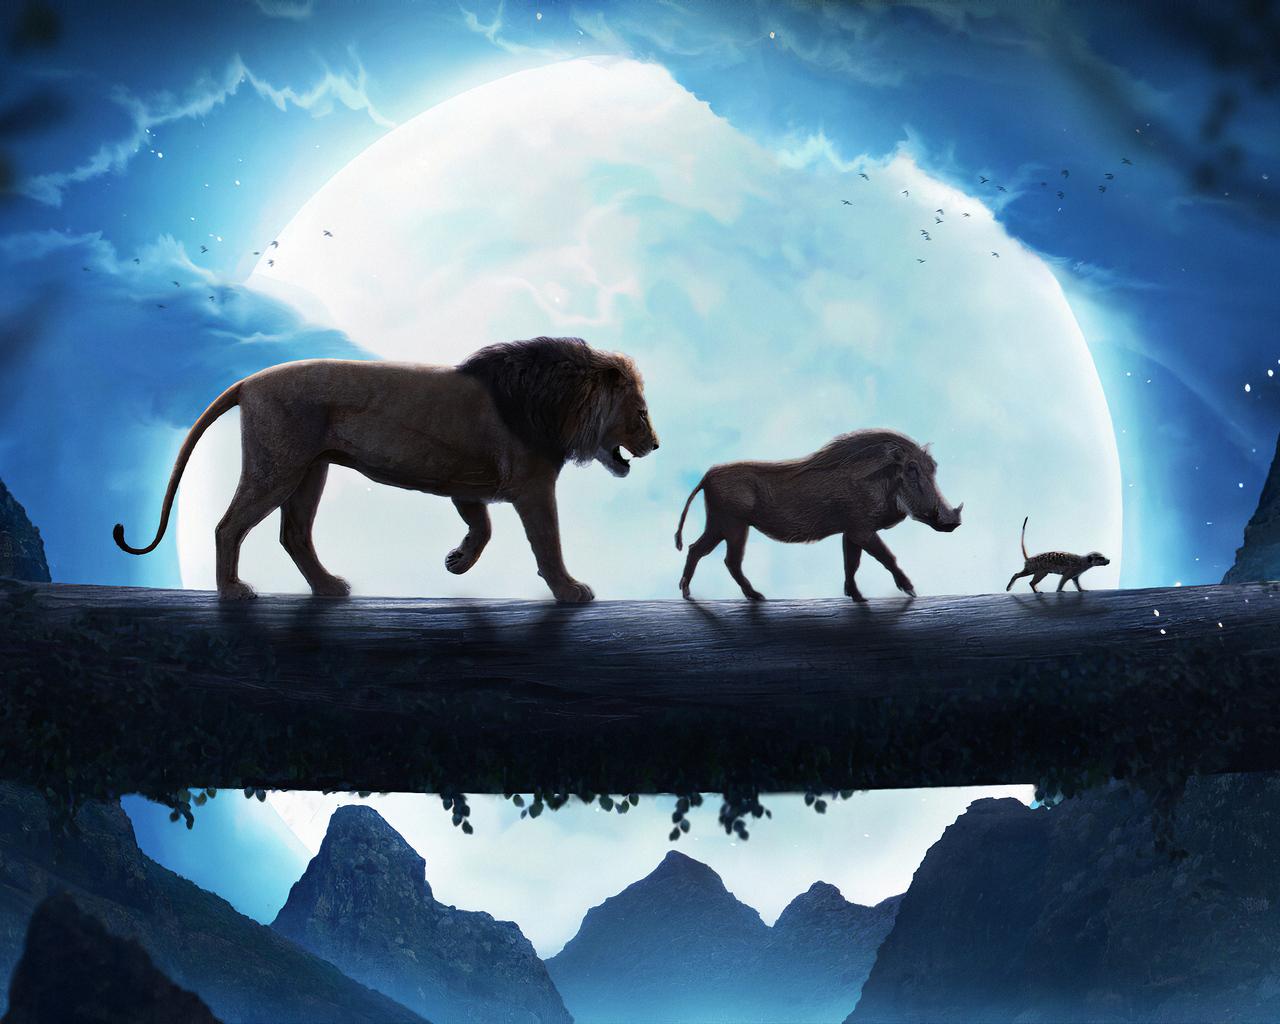 the-lion-king-simba-pumbaa-timon-2v.jpg